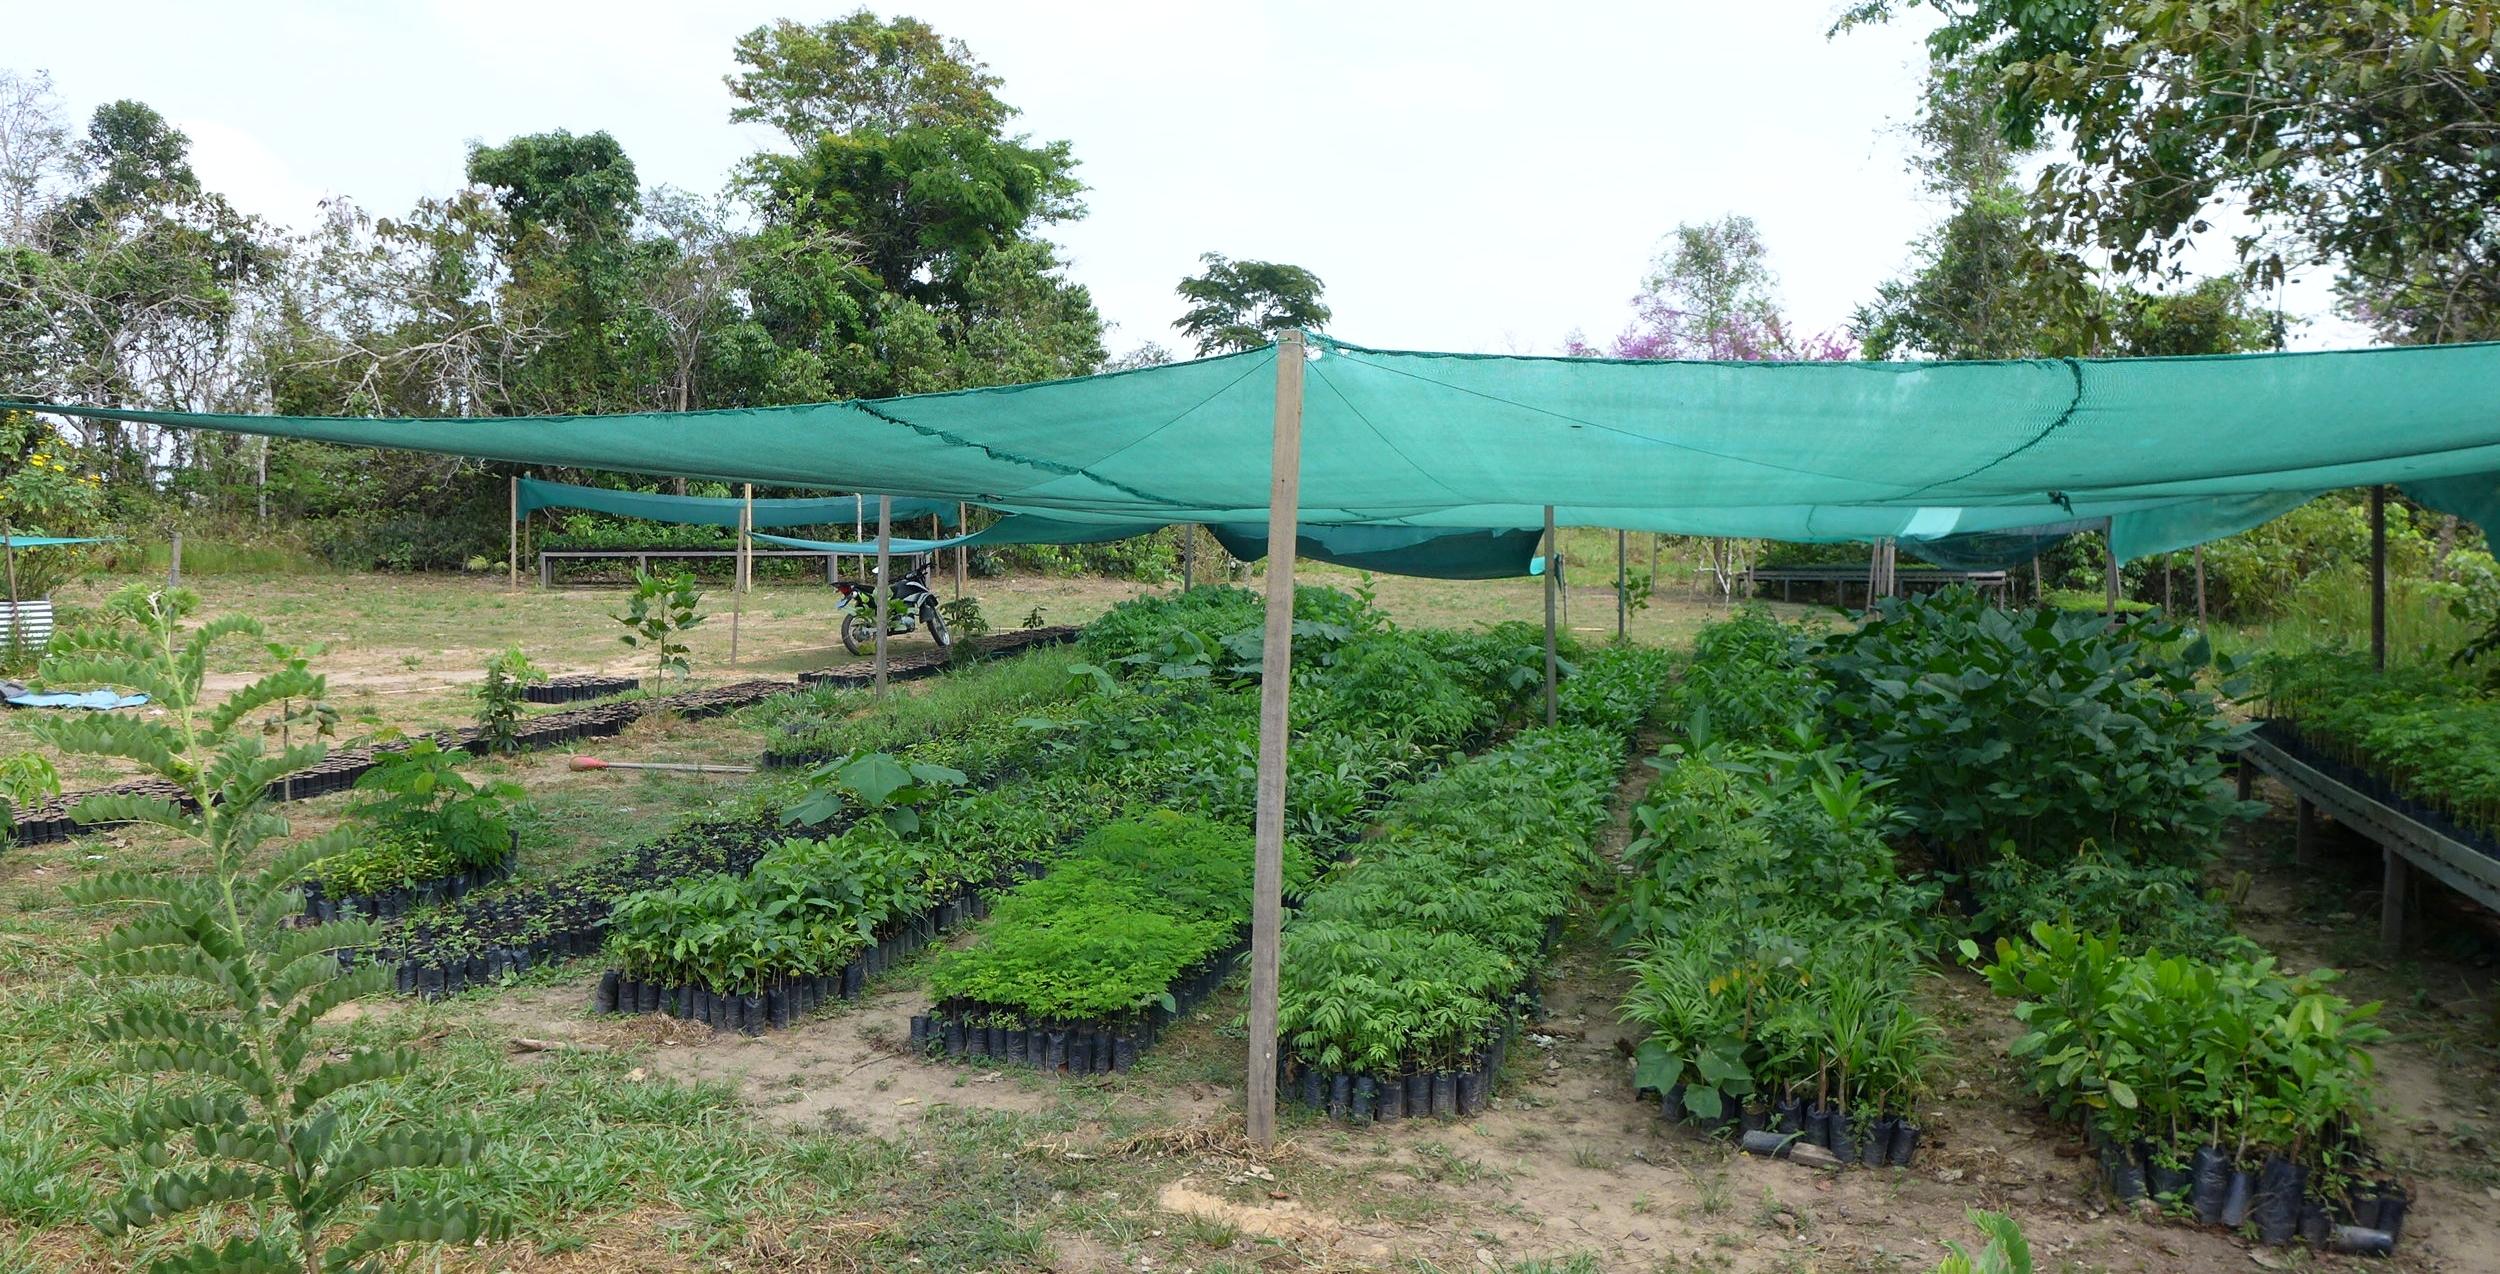 One area of the Camino Verde La Joya Forestry Nursery